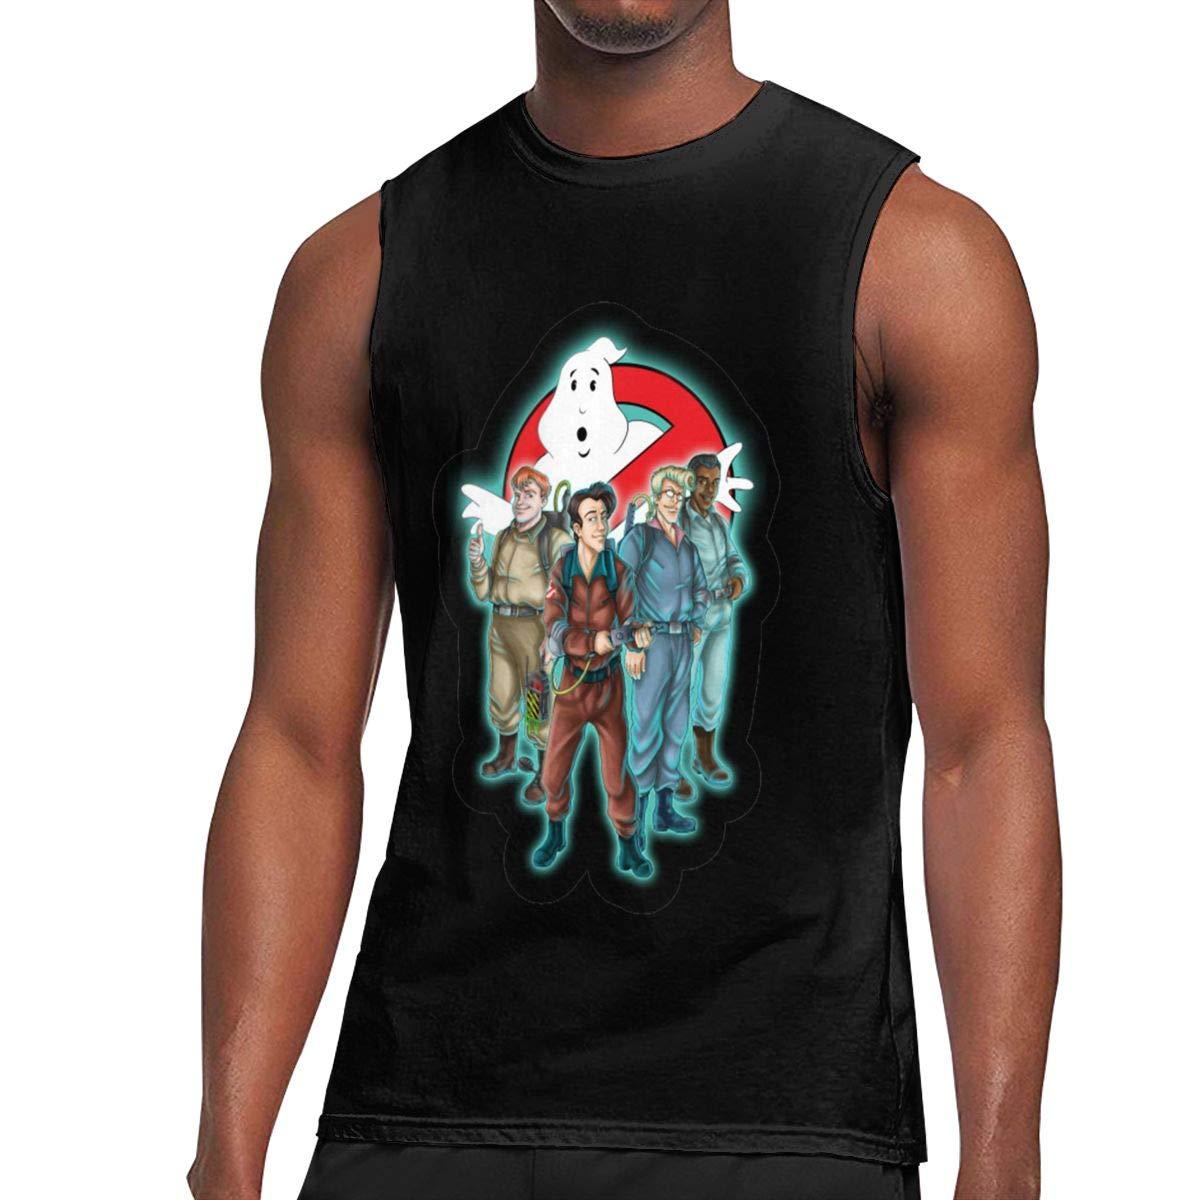 Nanakang Geek Ghostbusters Sleeveless Round Neck Summer Sport Tees Cool Black Shirts